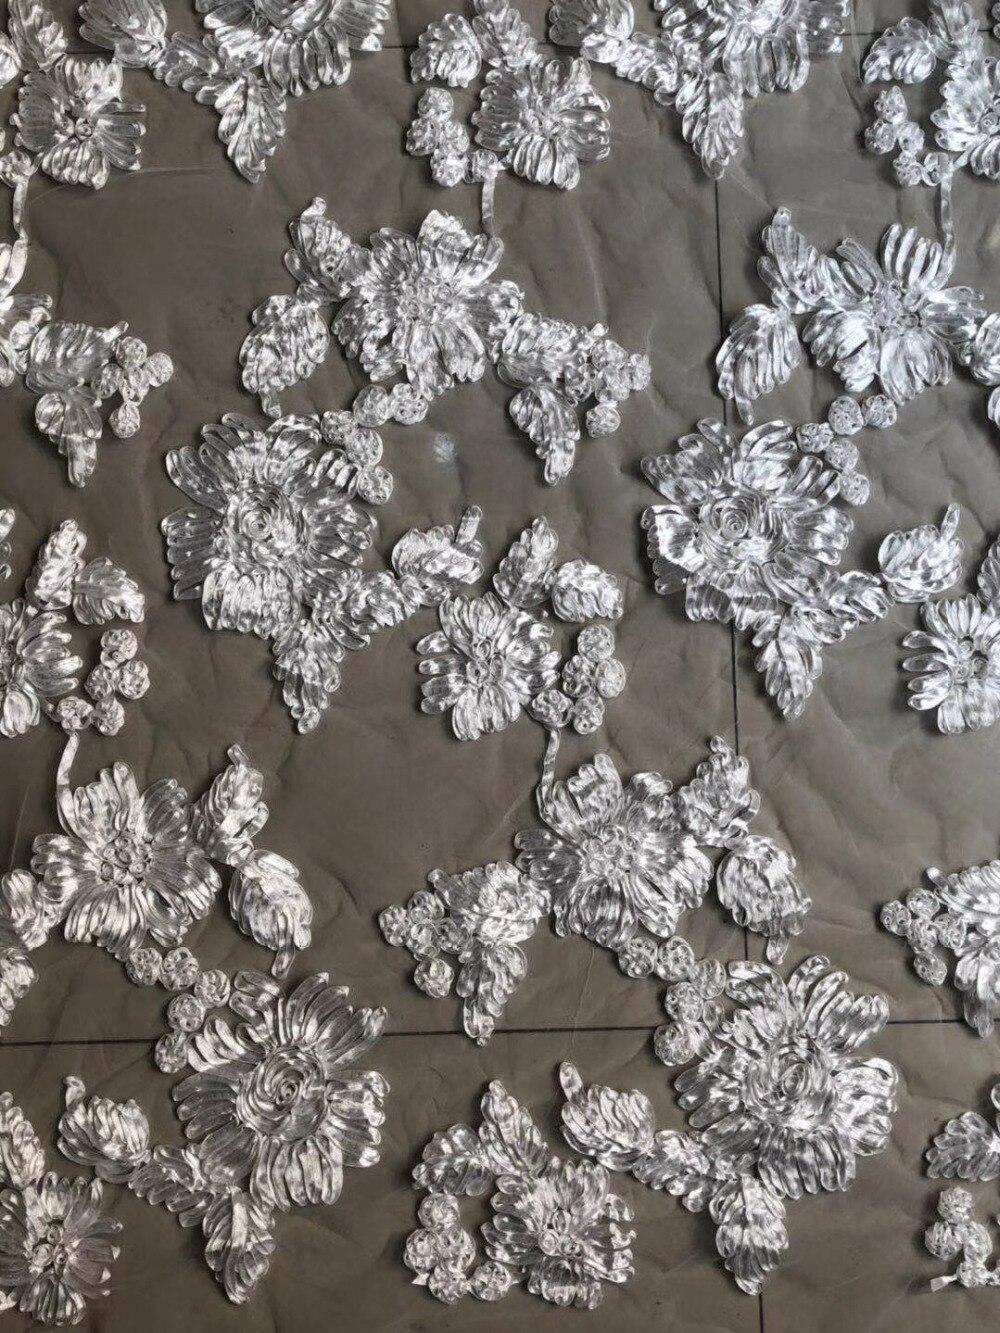 BEAUTIFICAL Nigeriaanse Netto Kant Stof Grote rode 3D Bloemen Kant 2018 Fashion Franse Kant Stof Voor Bruiloft 5 yards Bruiloft jurk-in Kant van Huis & Tuin op  Groep 2